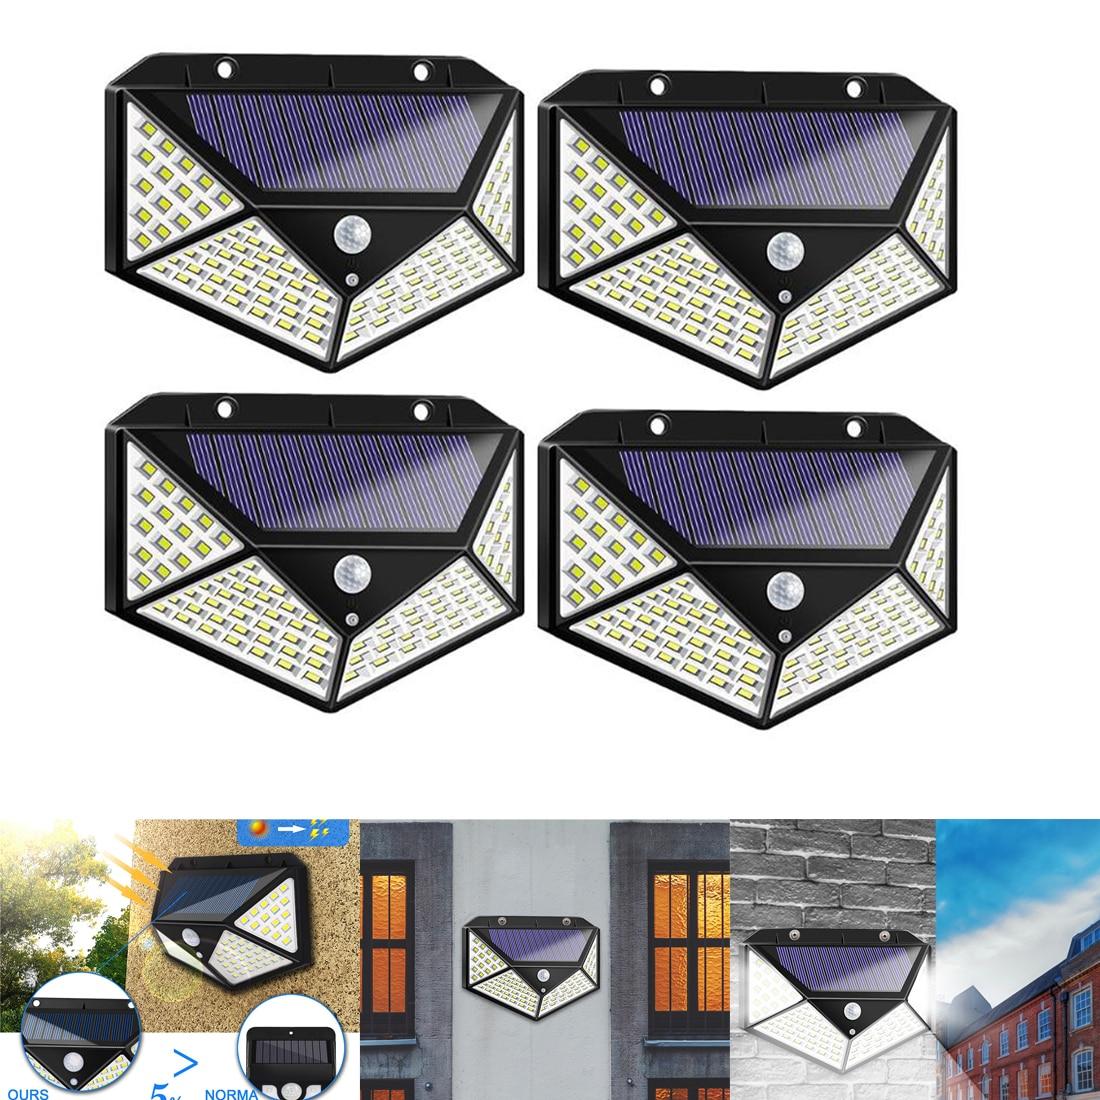 1/2/4pcs Outdoor 100 LED Solar Light Waterproof 4-side Sunlight Solar Powered Lamp PIR Motion Sensor Wall Light for Garden Decor